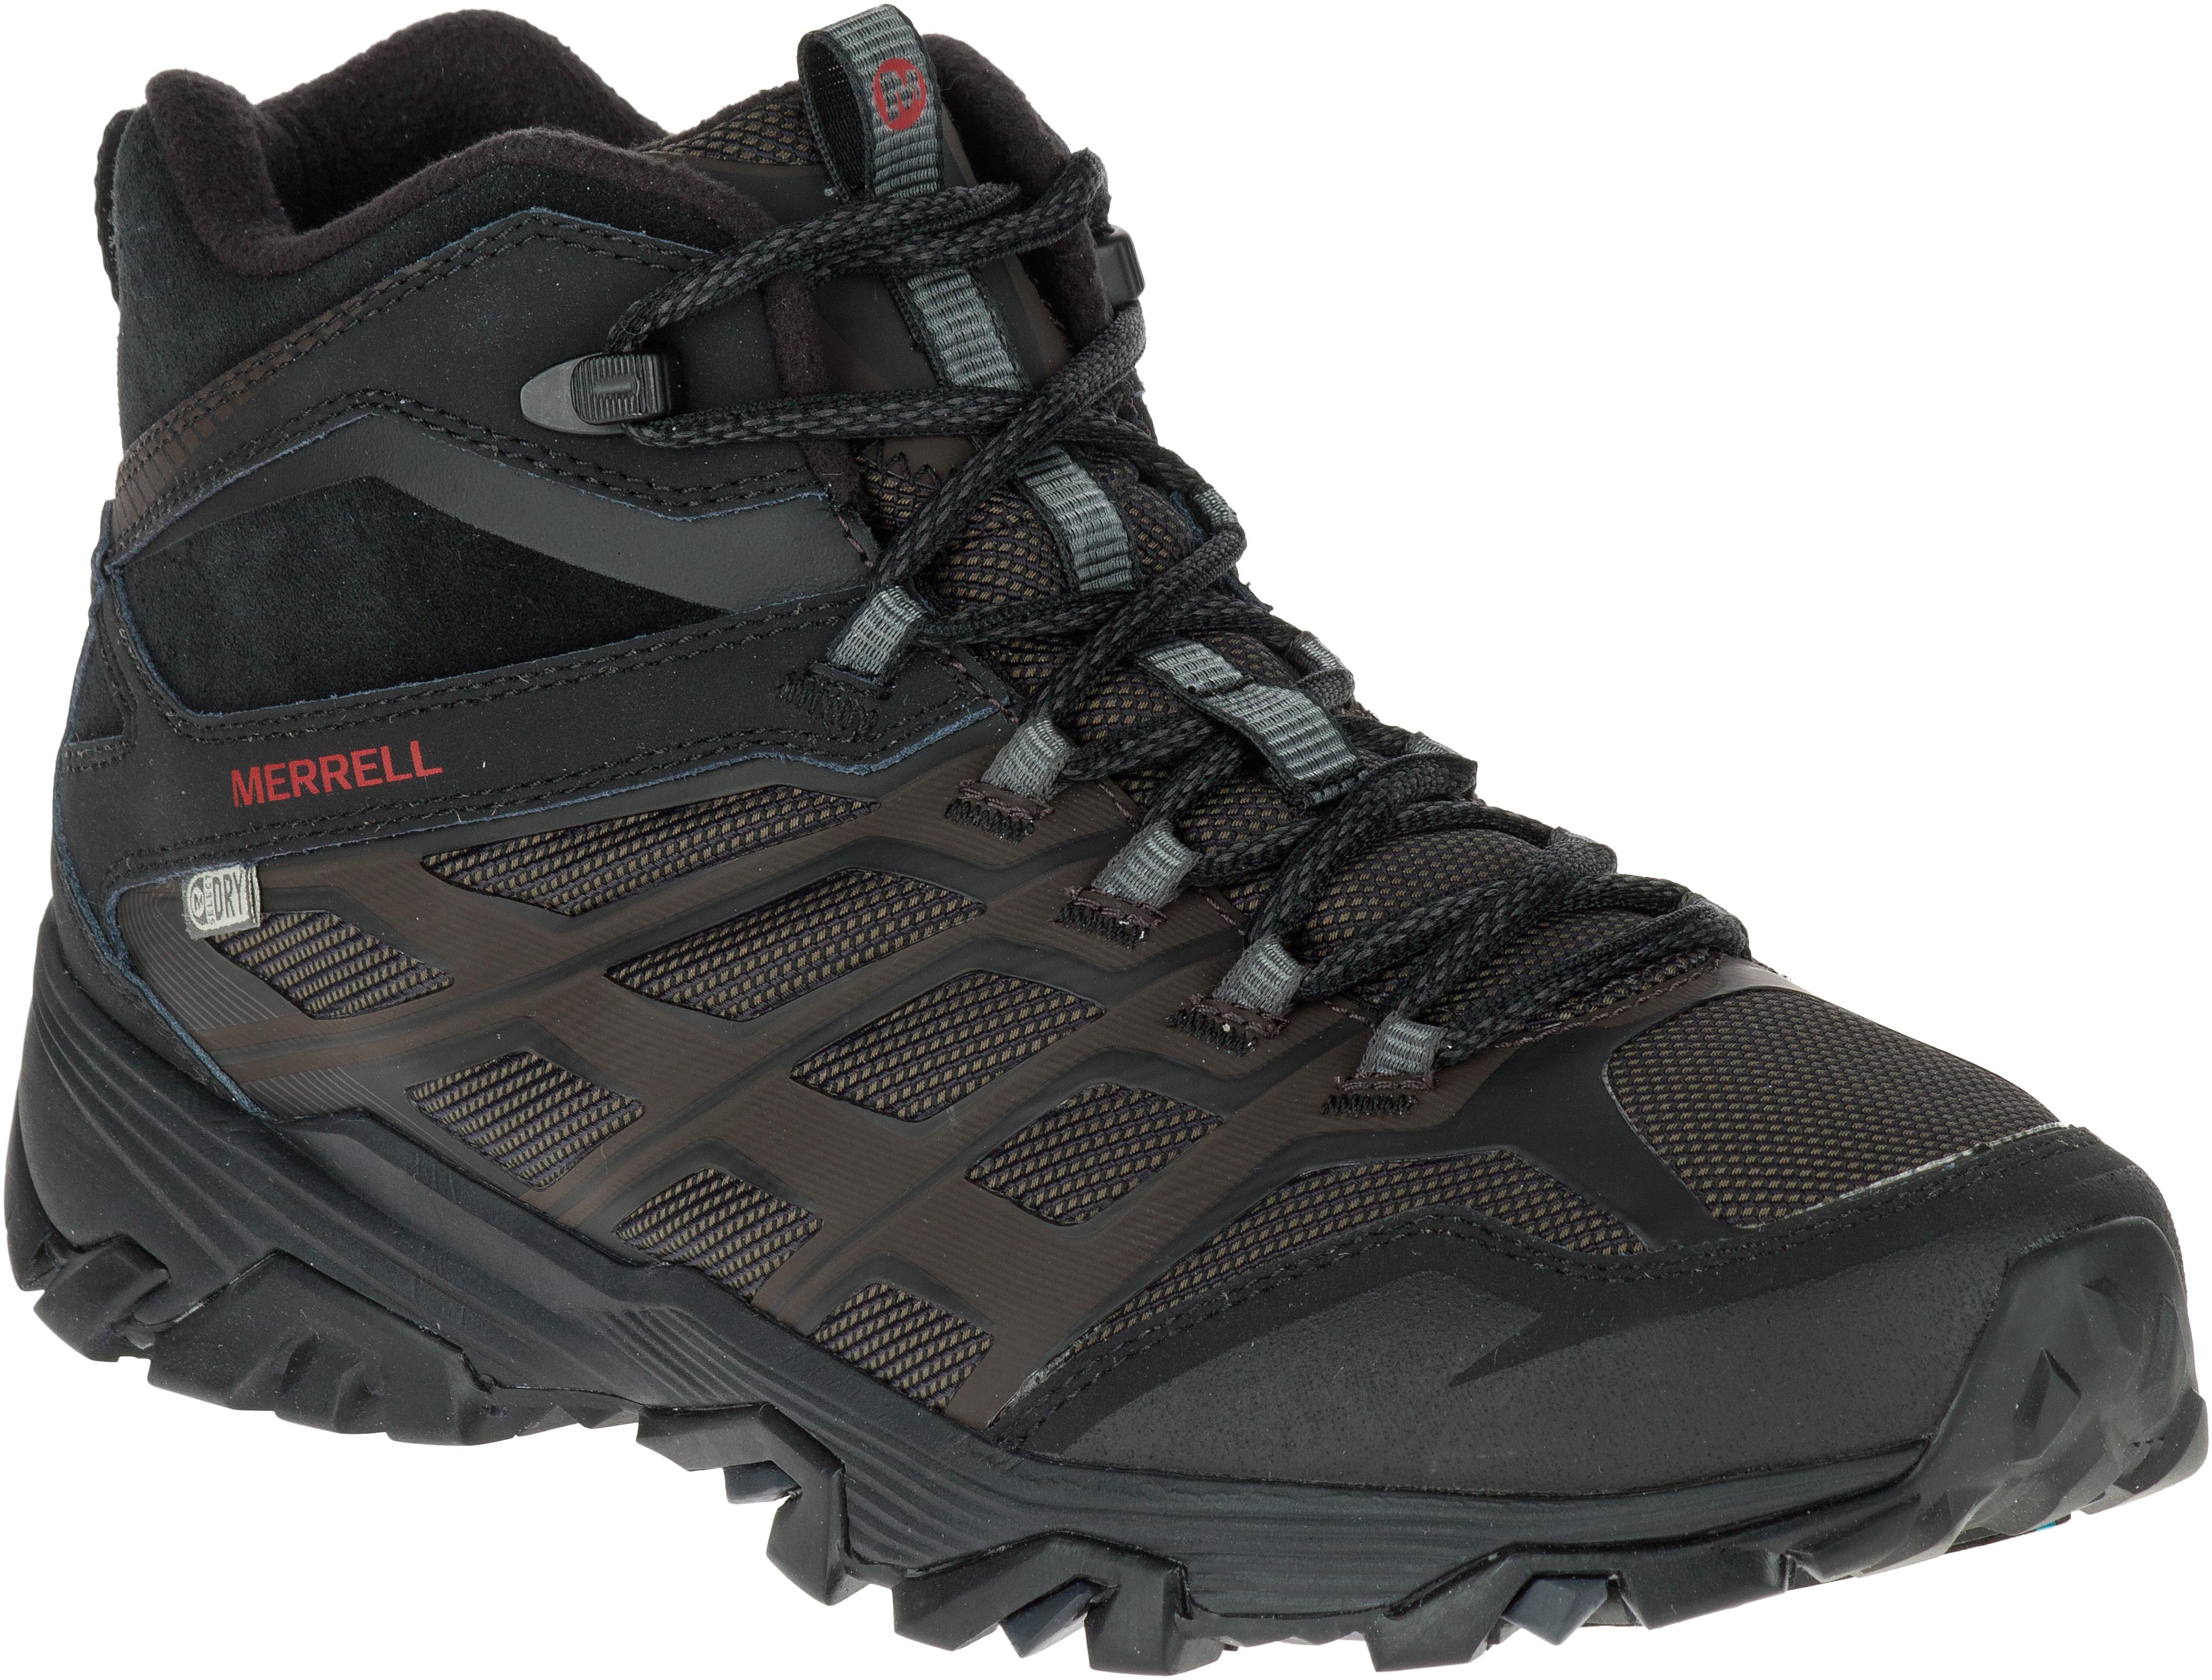 40b2cc4ec3 Merrell Moab FST Ice+ Waterproof Thermo Winter Boots - Men's | MEC